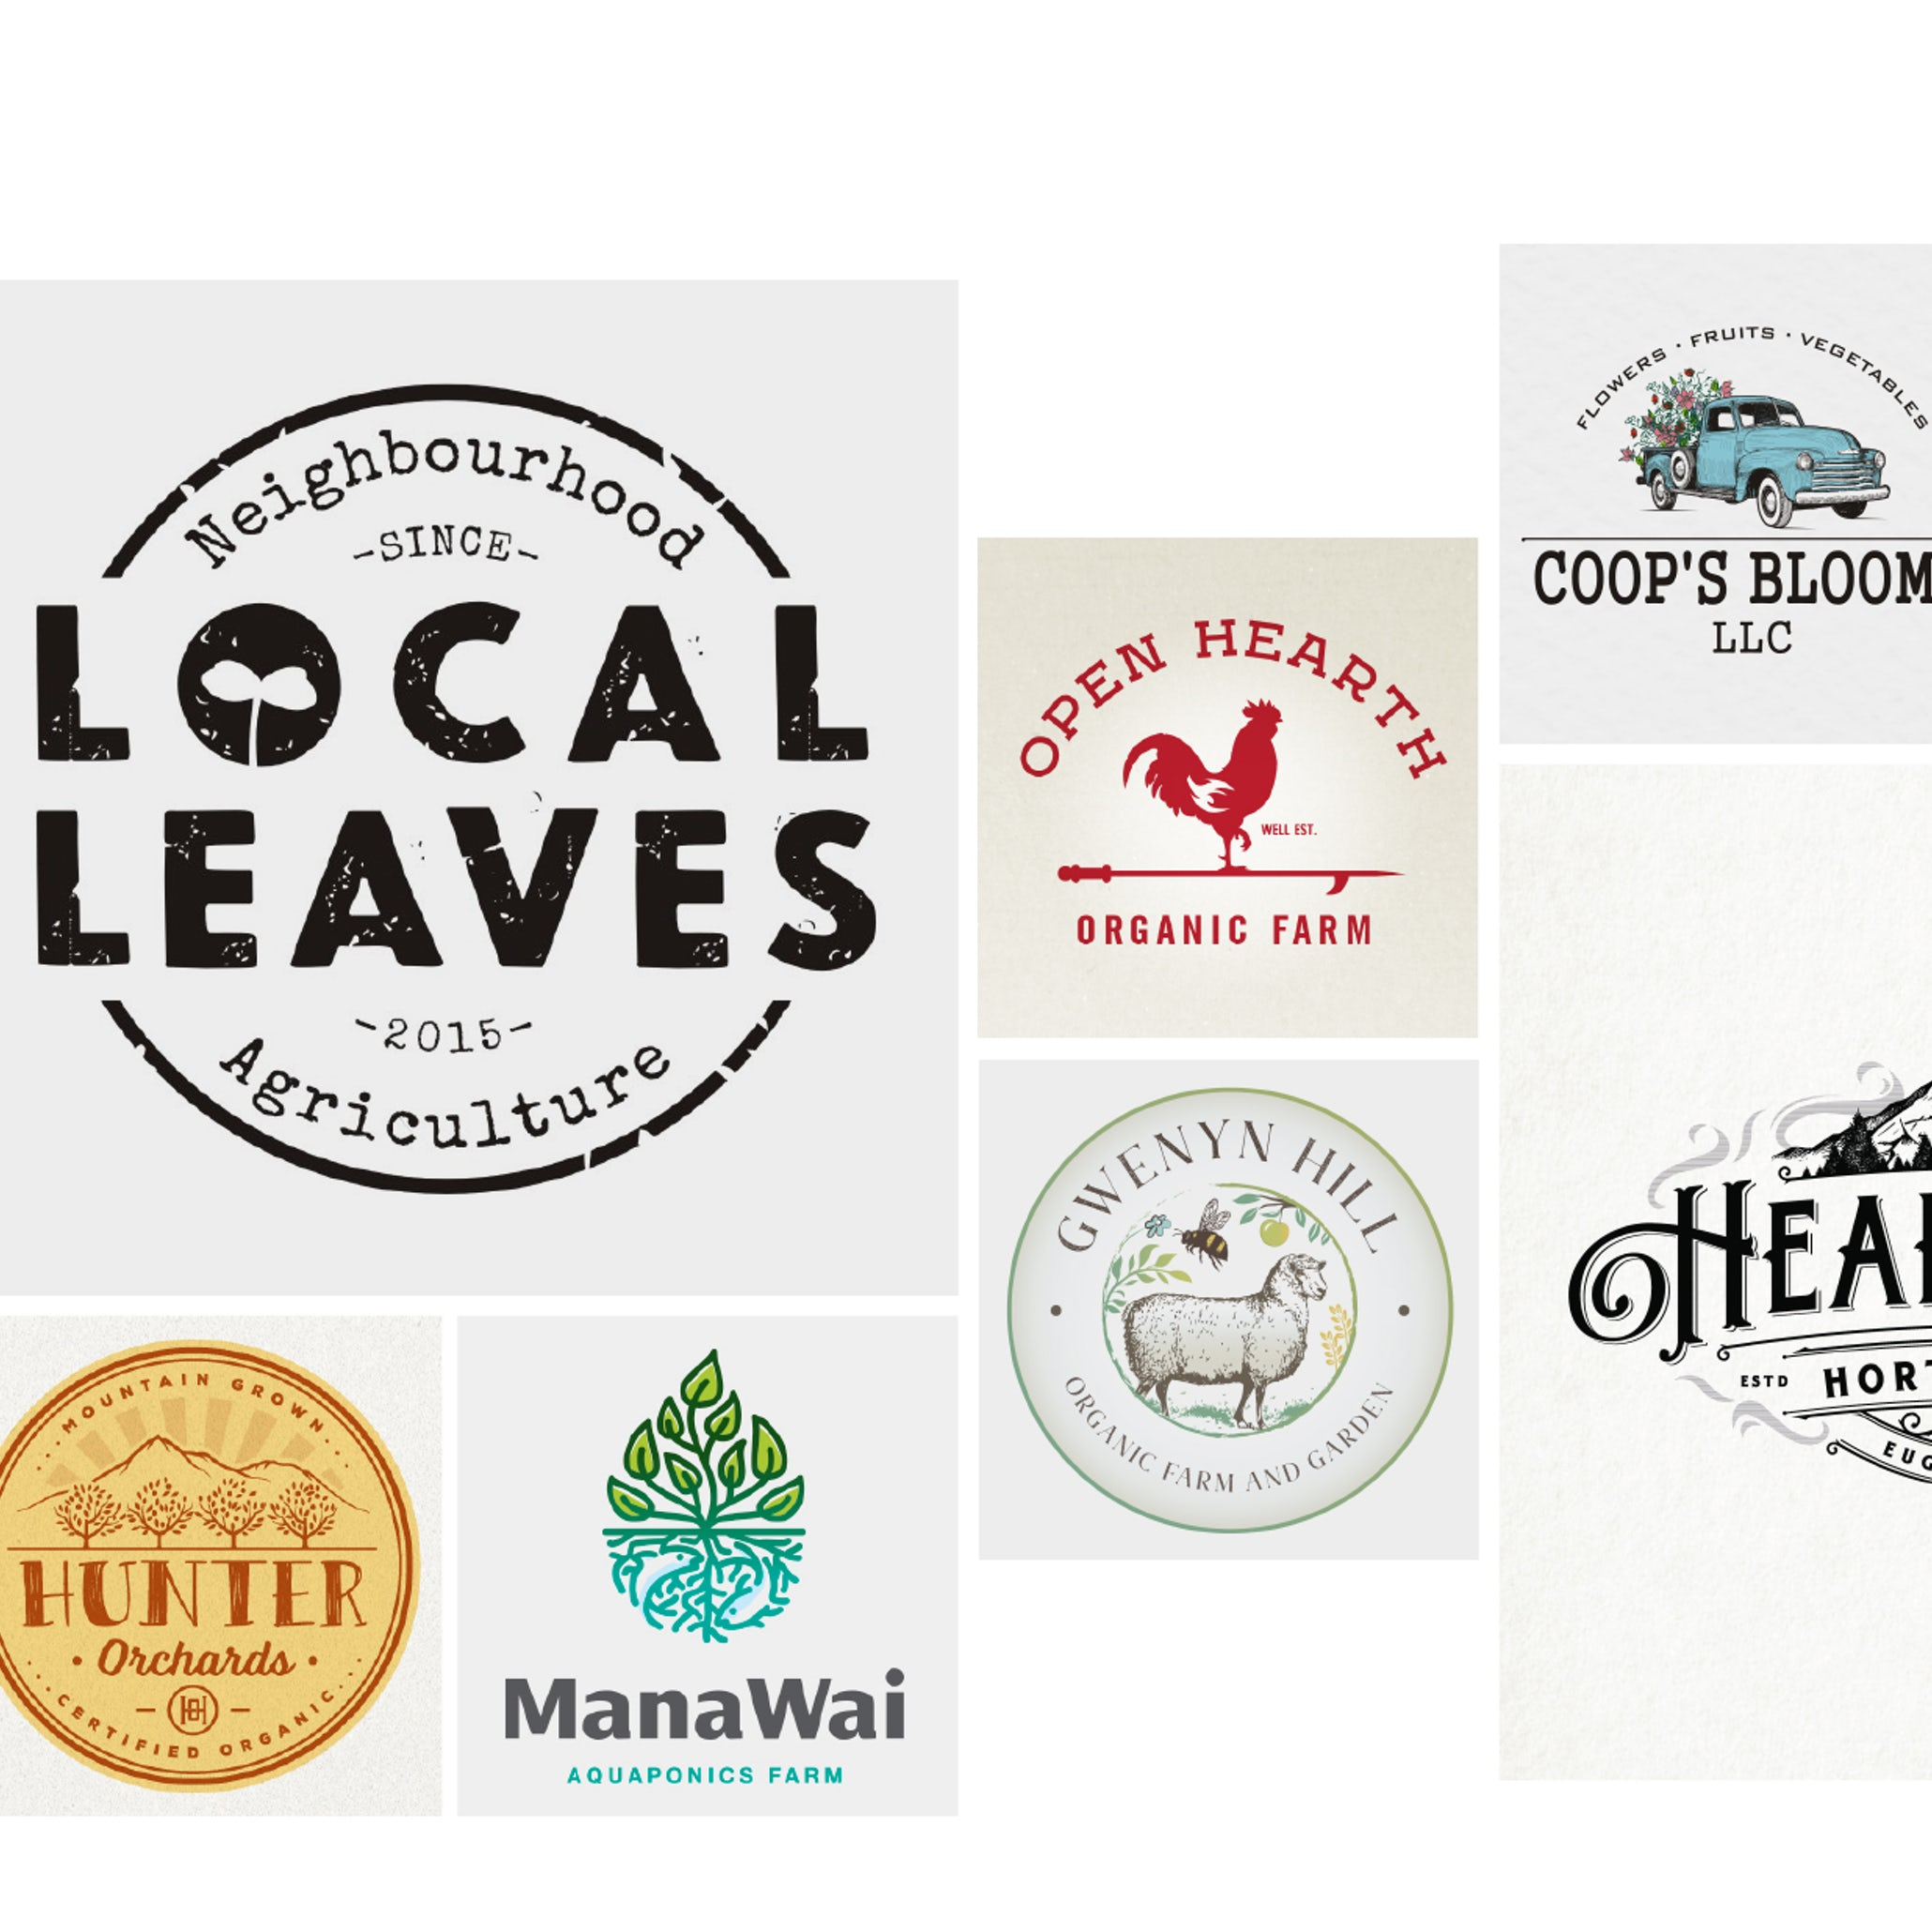 32 farm logos we really dig - 99designs